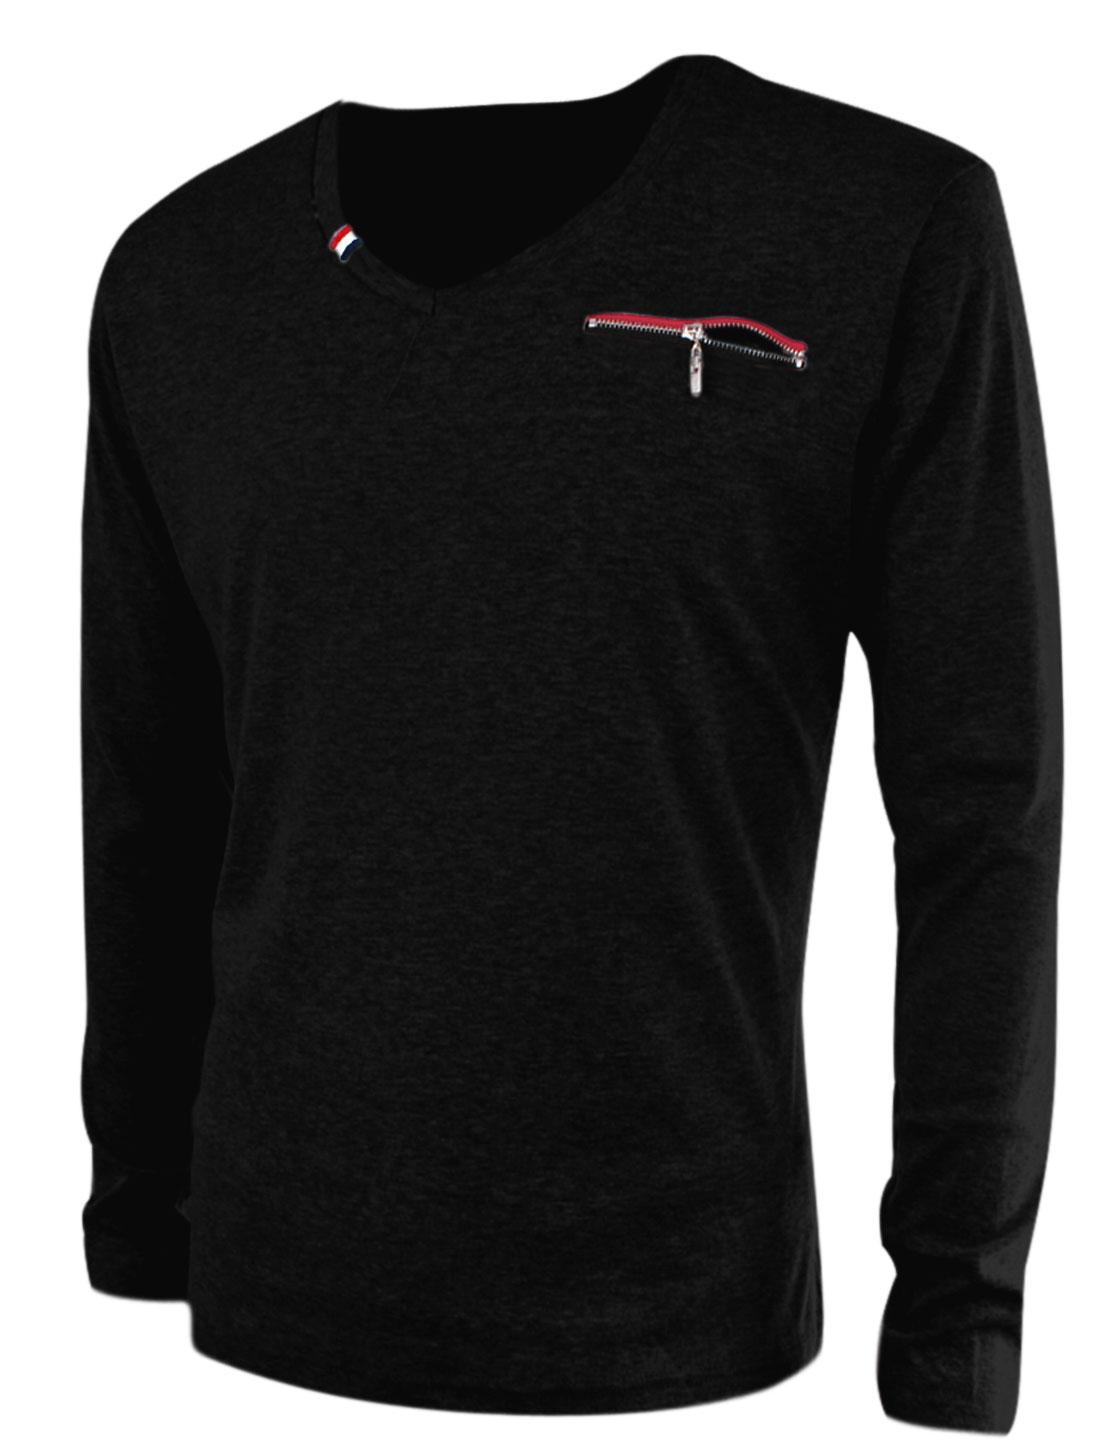 New Fashion V Neck Long Sleeve Stretch T-Shirt for Men Black M